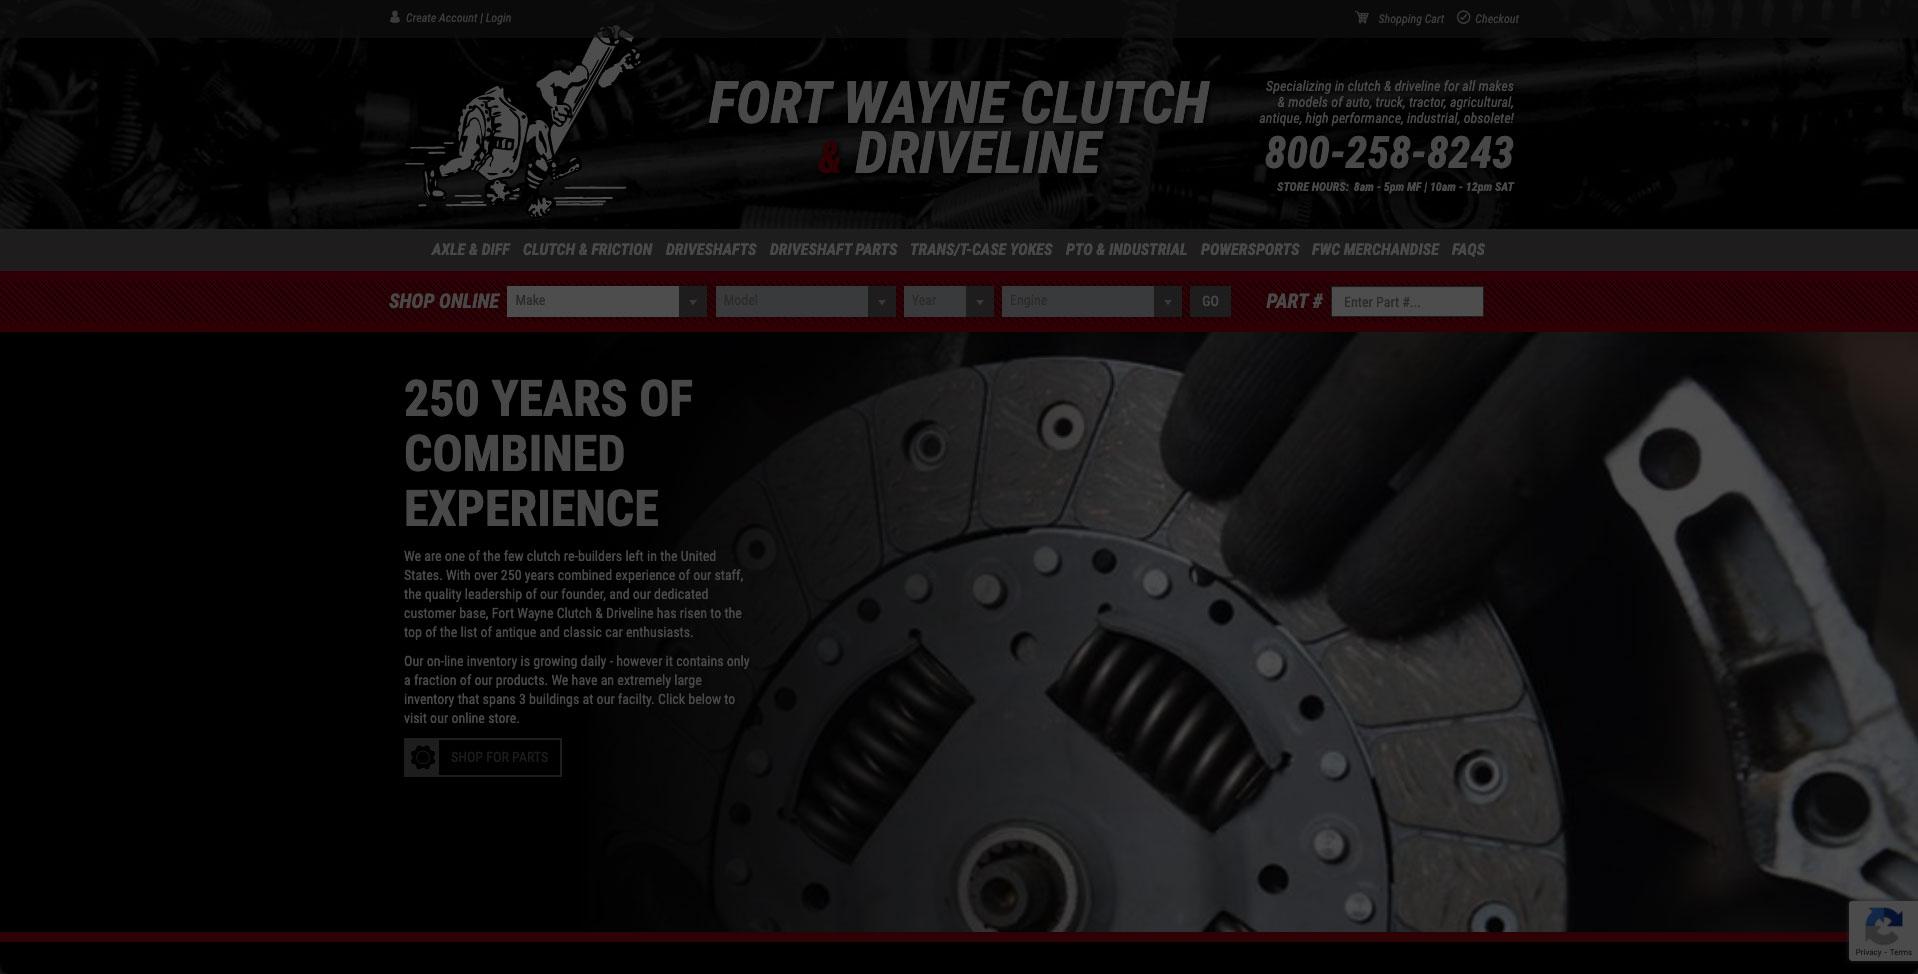 Fort Wayne Clutch & Driveline